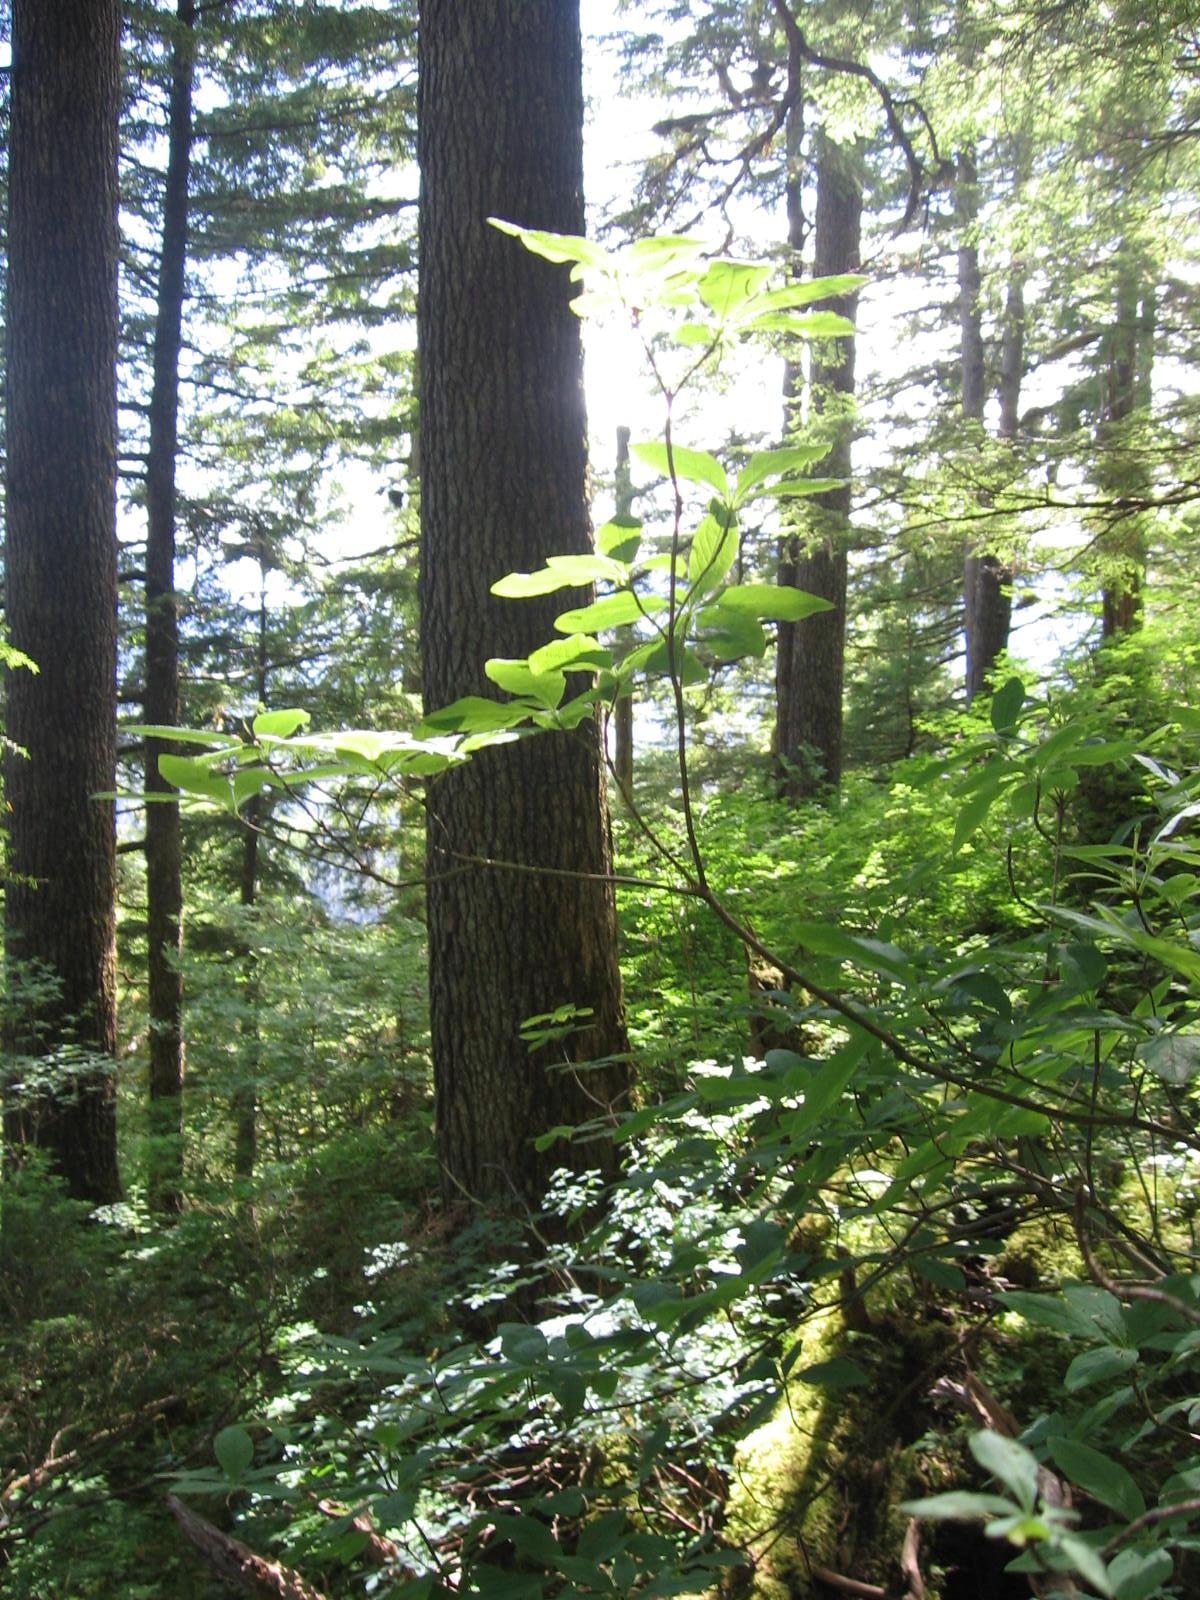 Alaska's roadless forest challenge dismissed